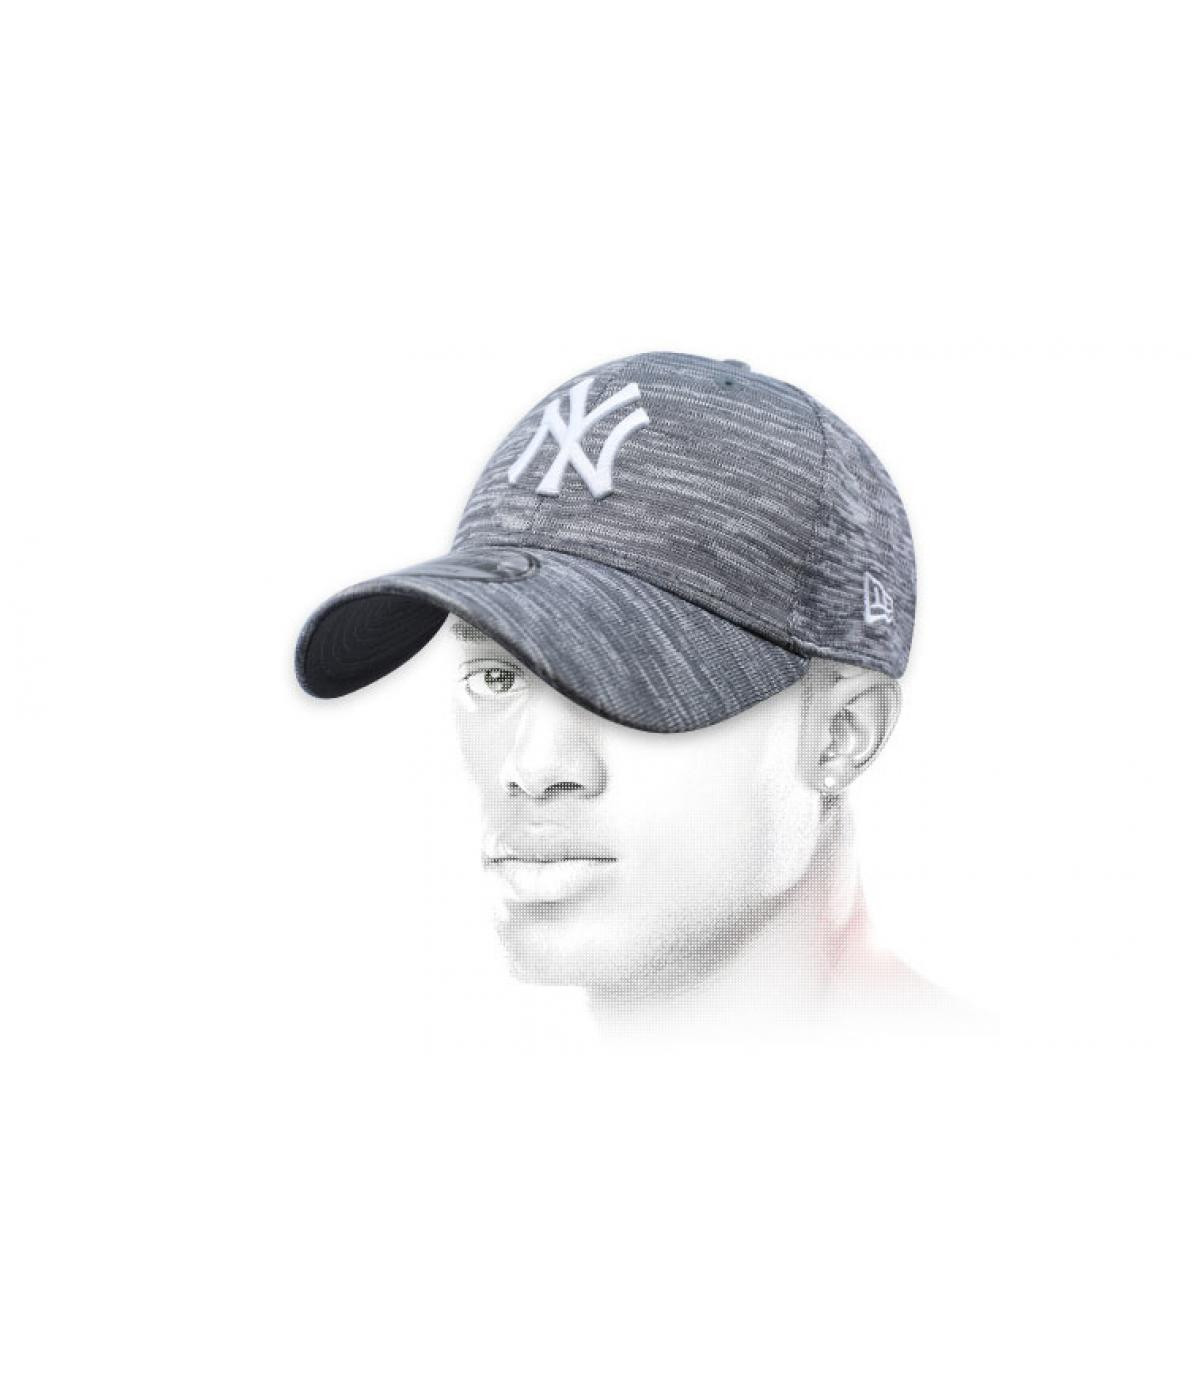 gorra NY gris jaspeado Engineered